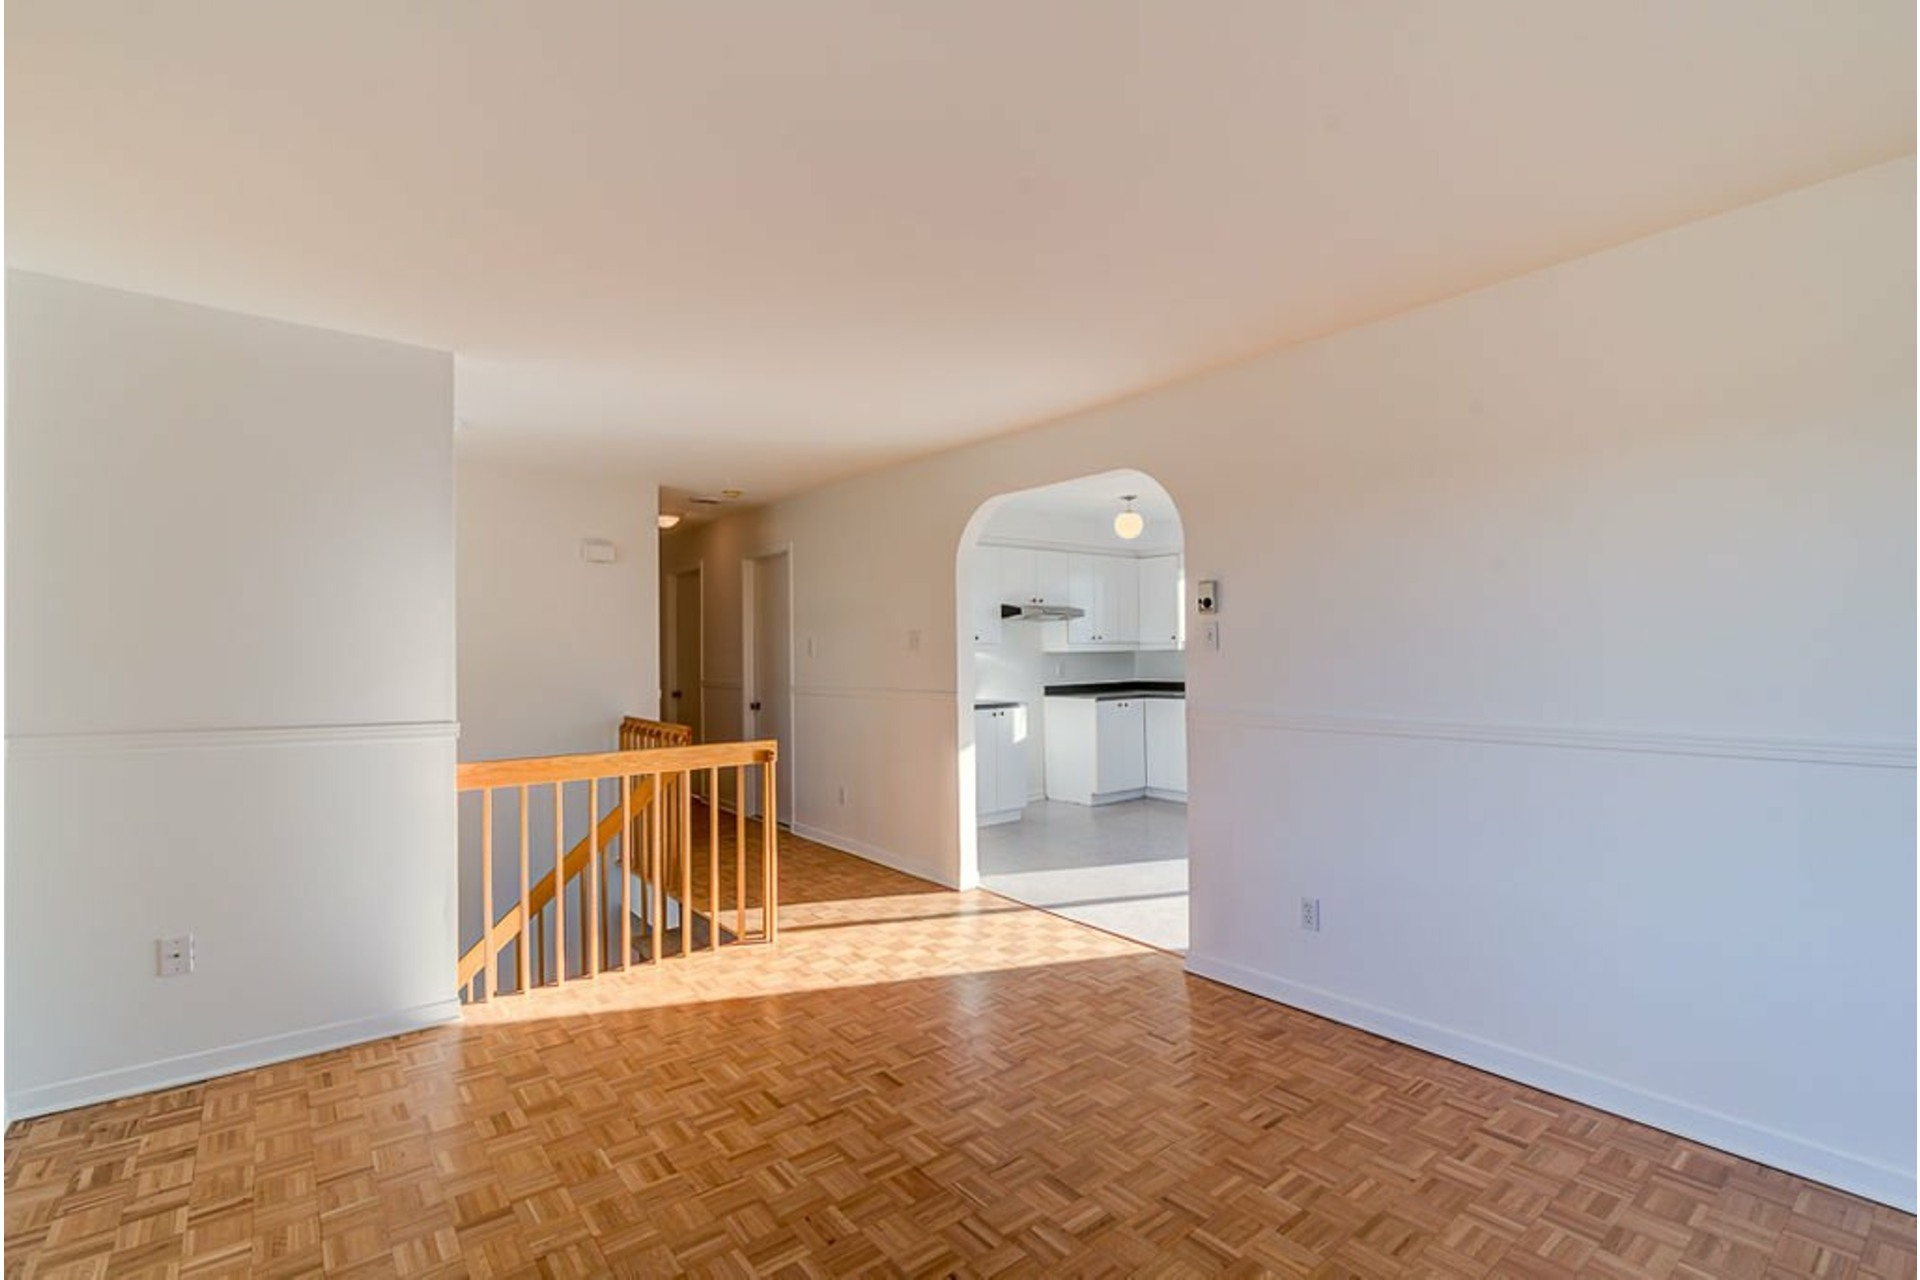 image 8 - House For sale Terrebonne Terrebonne  - 11 rooms